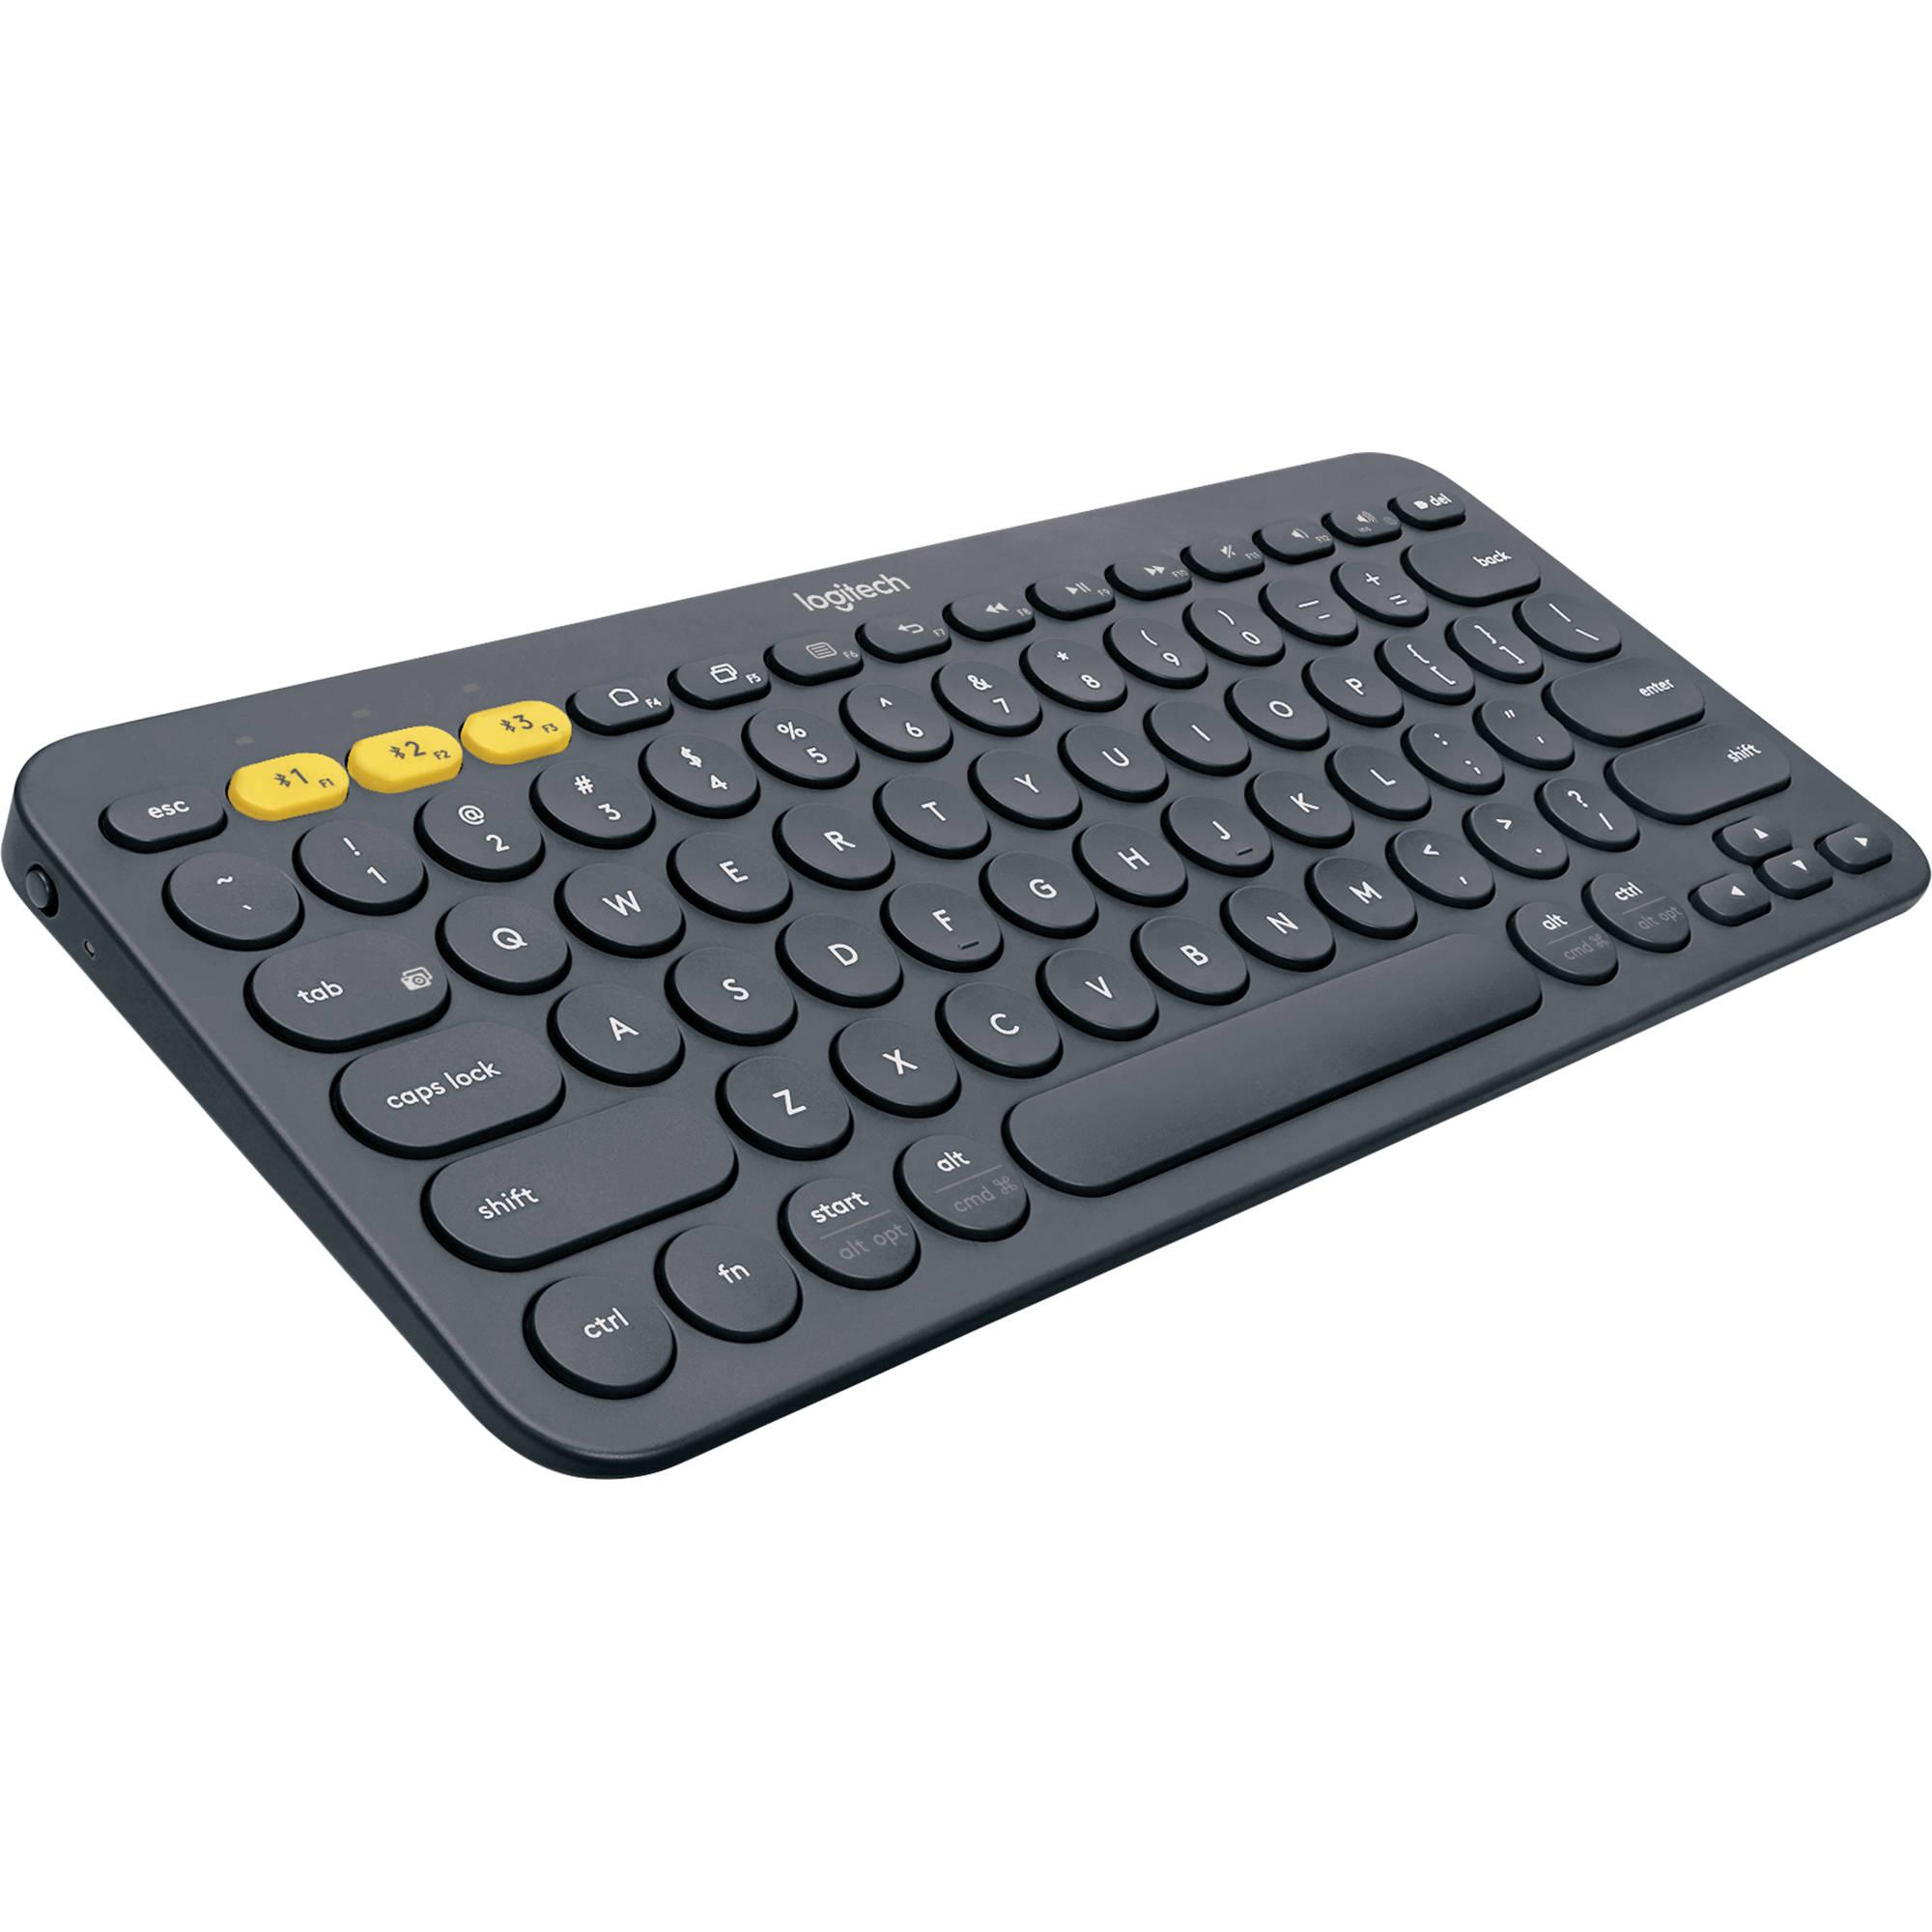 37d928ffafb Logitech K380 Bluetooth Keyboard (Black) 920-007558 B&H Photo